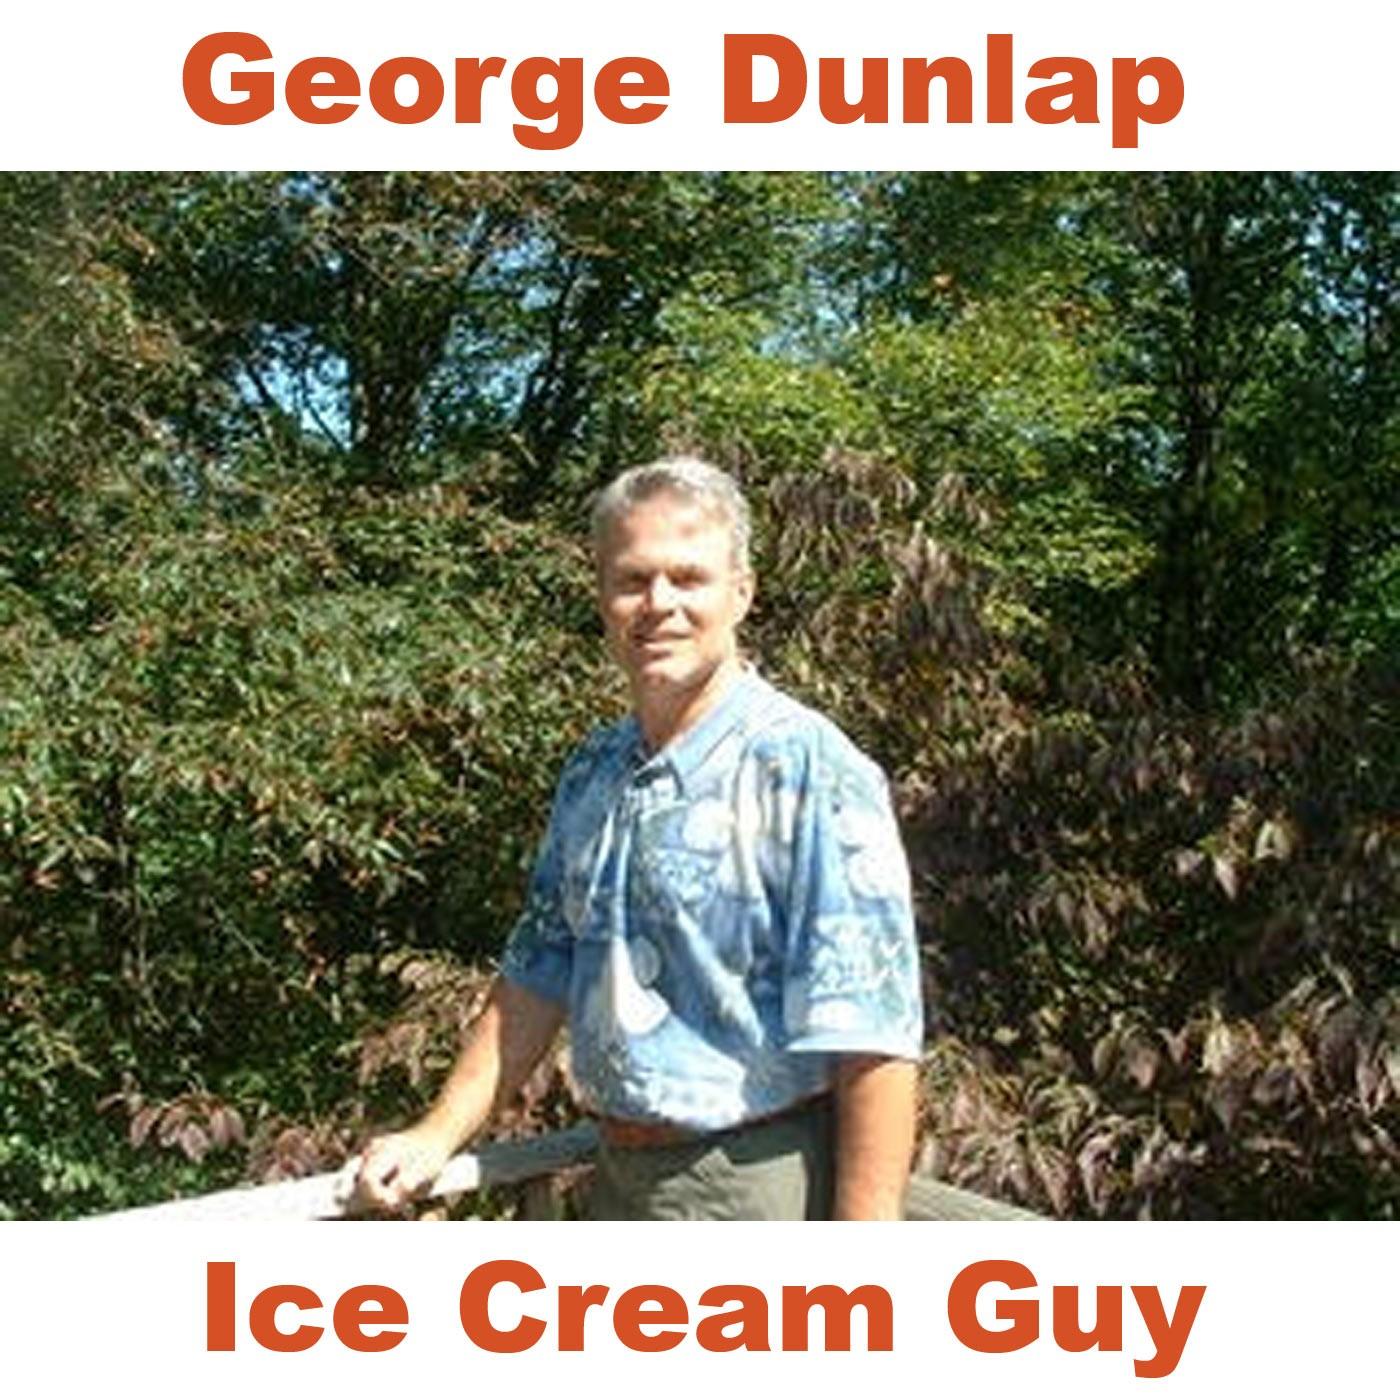 George Dunlap, The Ice Cream Guy